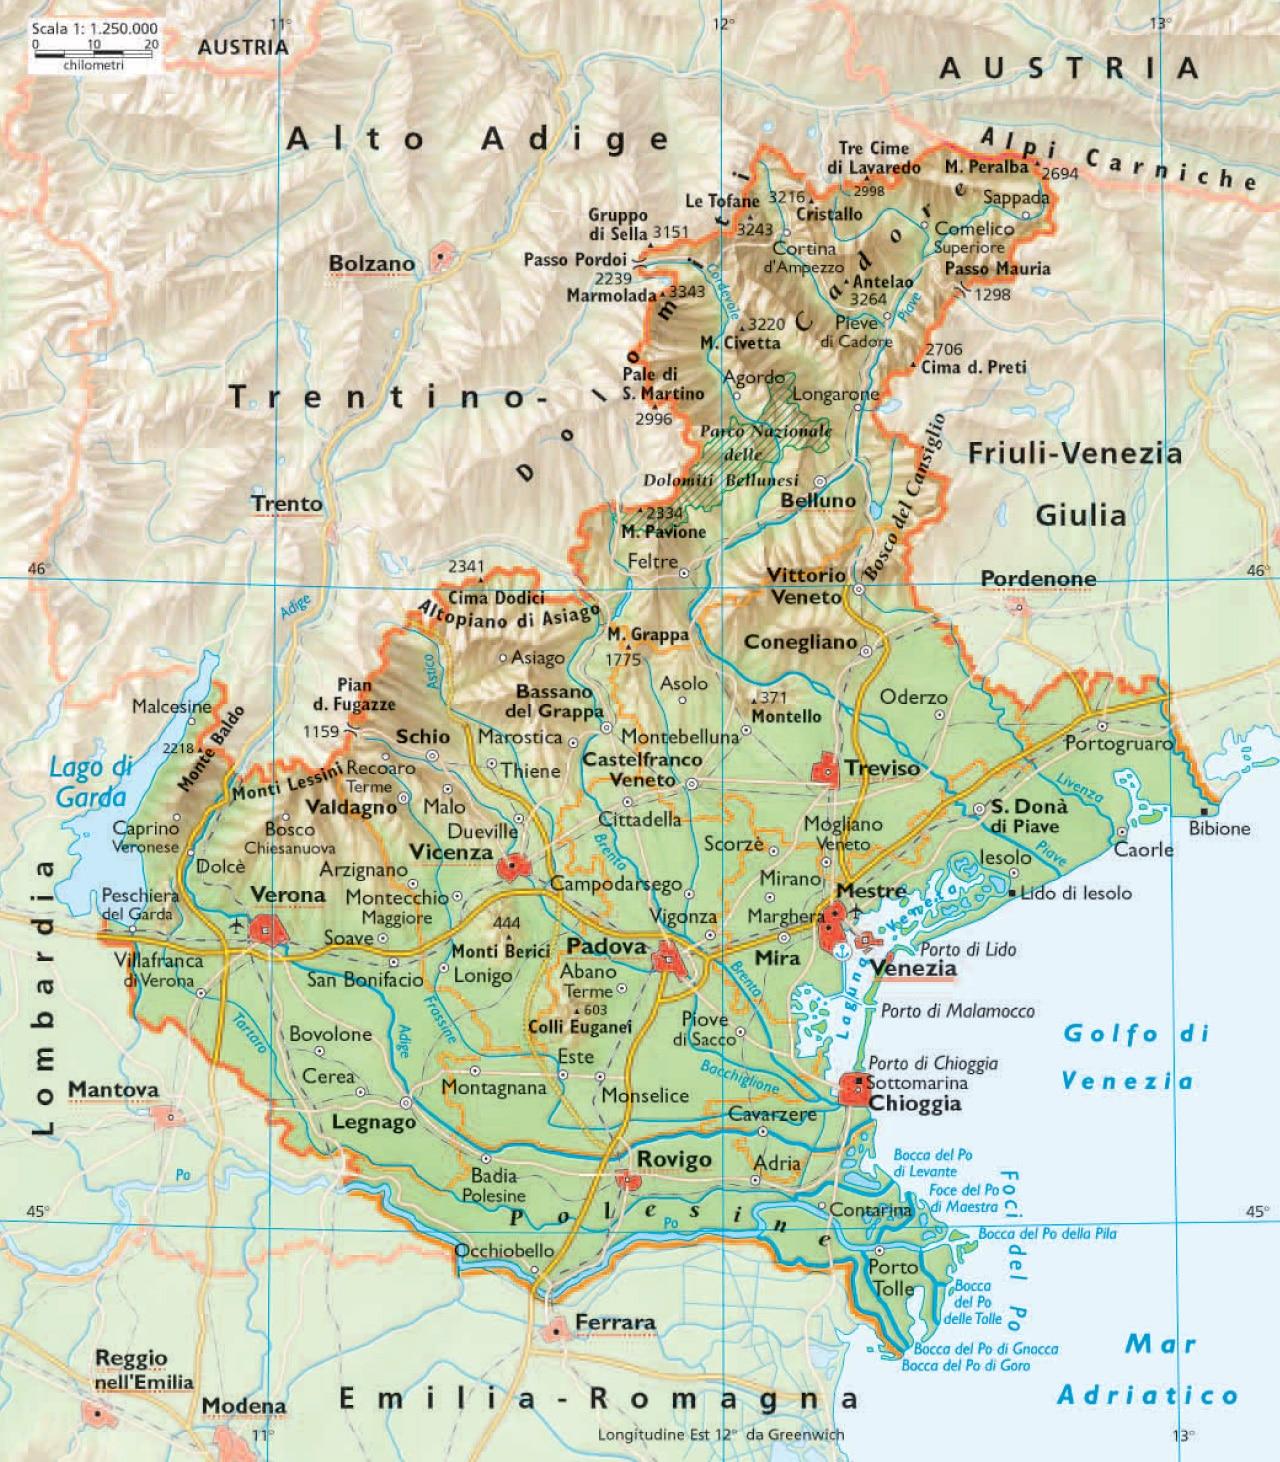 Trentino Alto Adige Cartina Fisica E Politica.Province Veneto Cartina